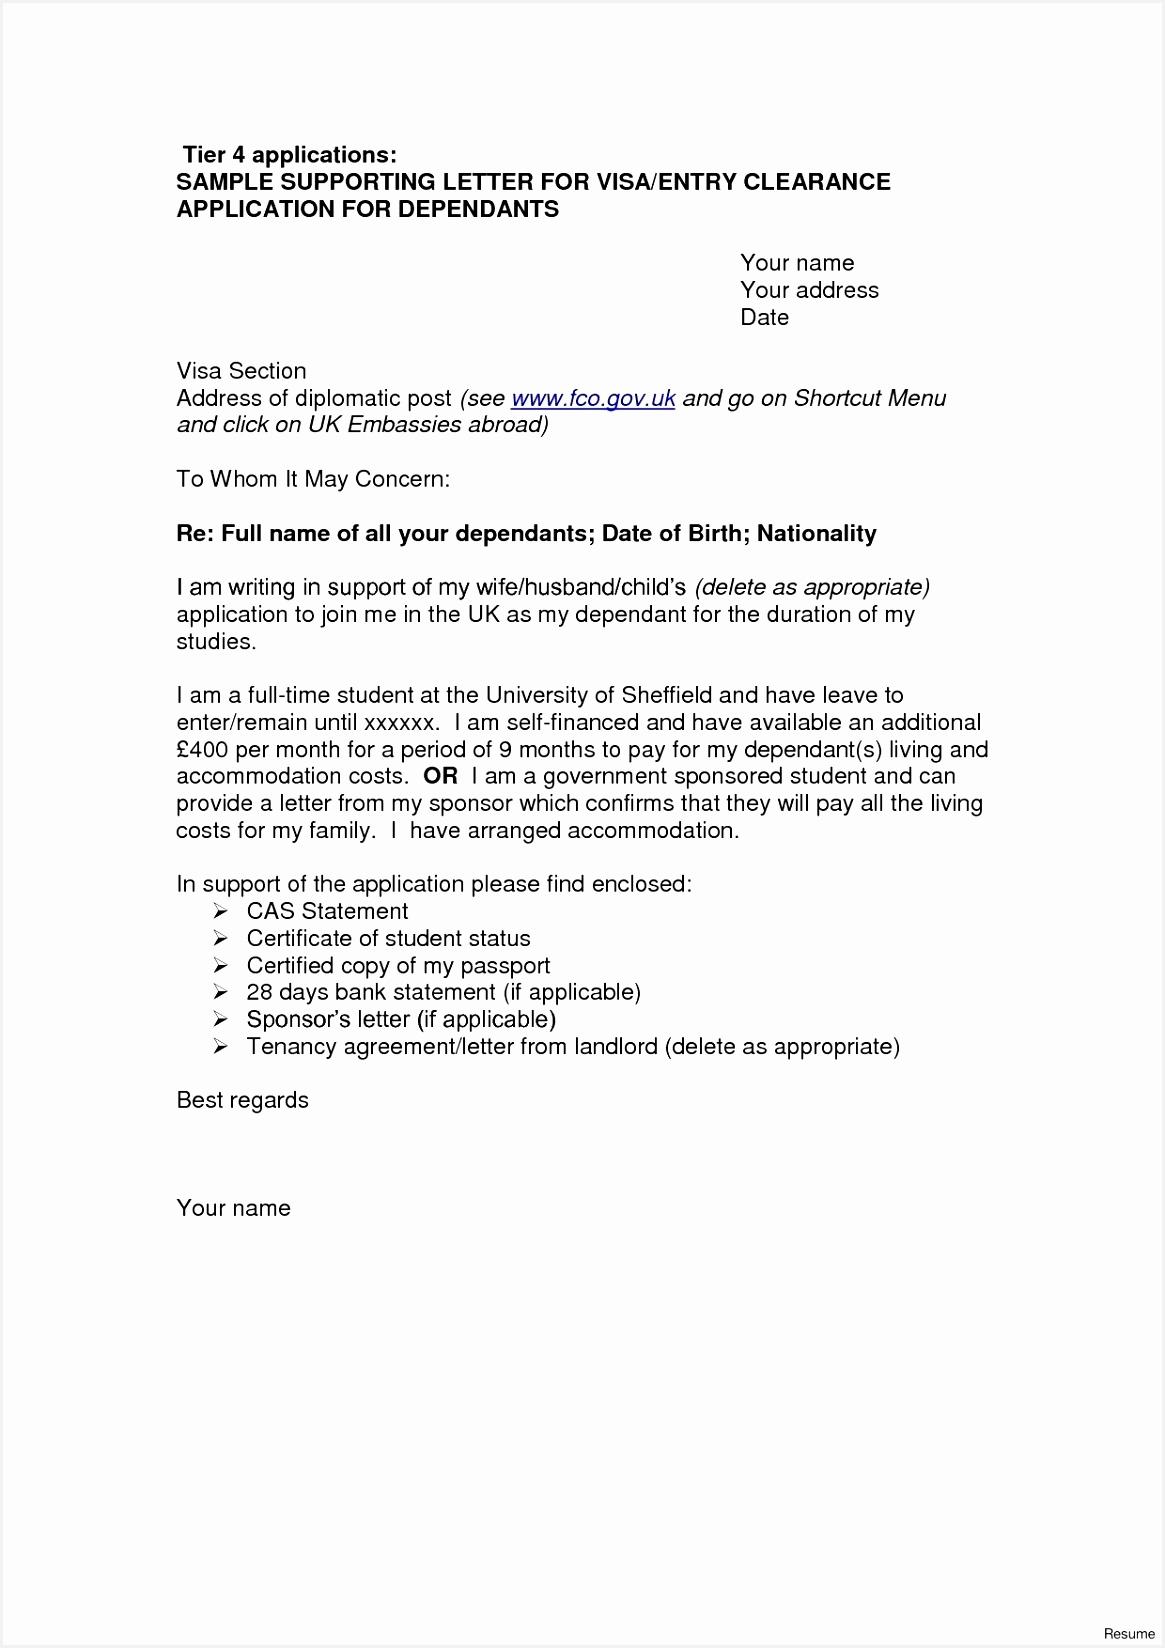 Re mendation Letter for Immigration Lovely Hardship Letter for Immigration Beautiful formal Letter Template Re mendation 16481165pbrYt